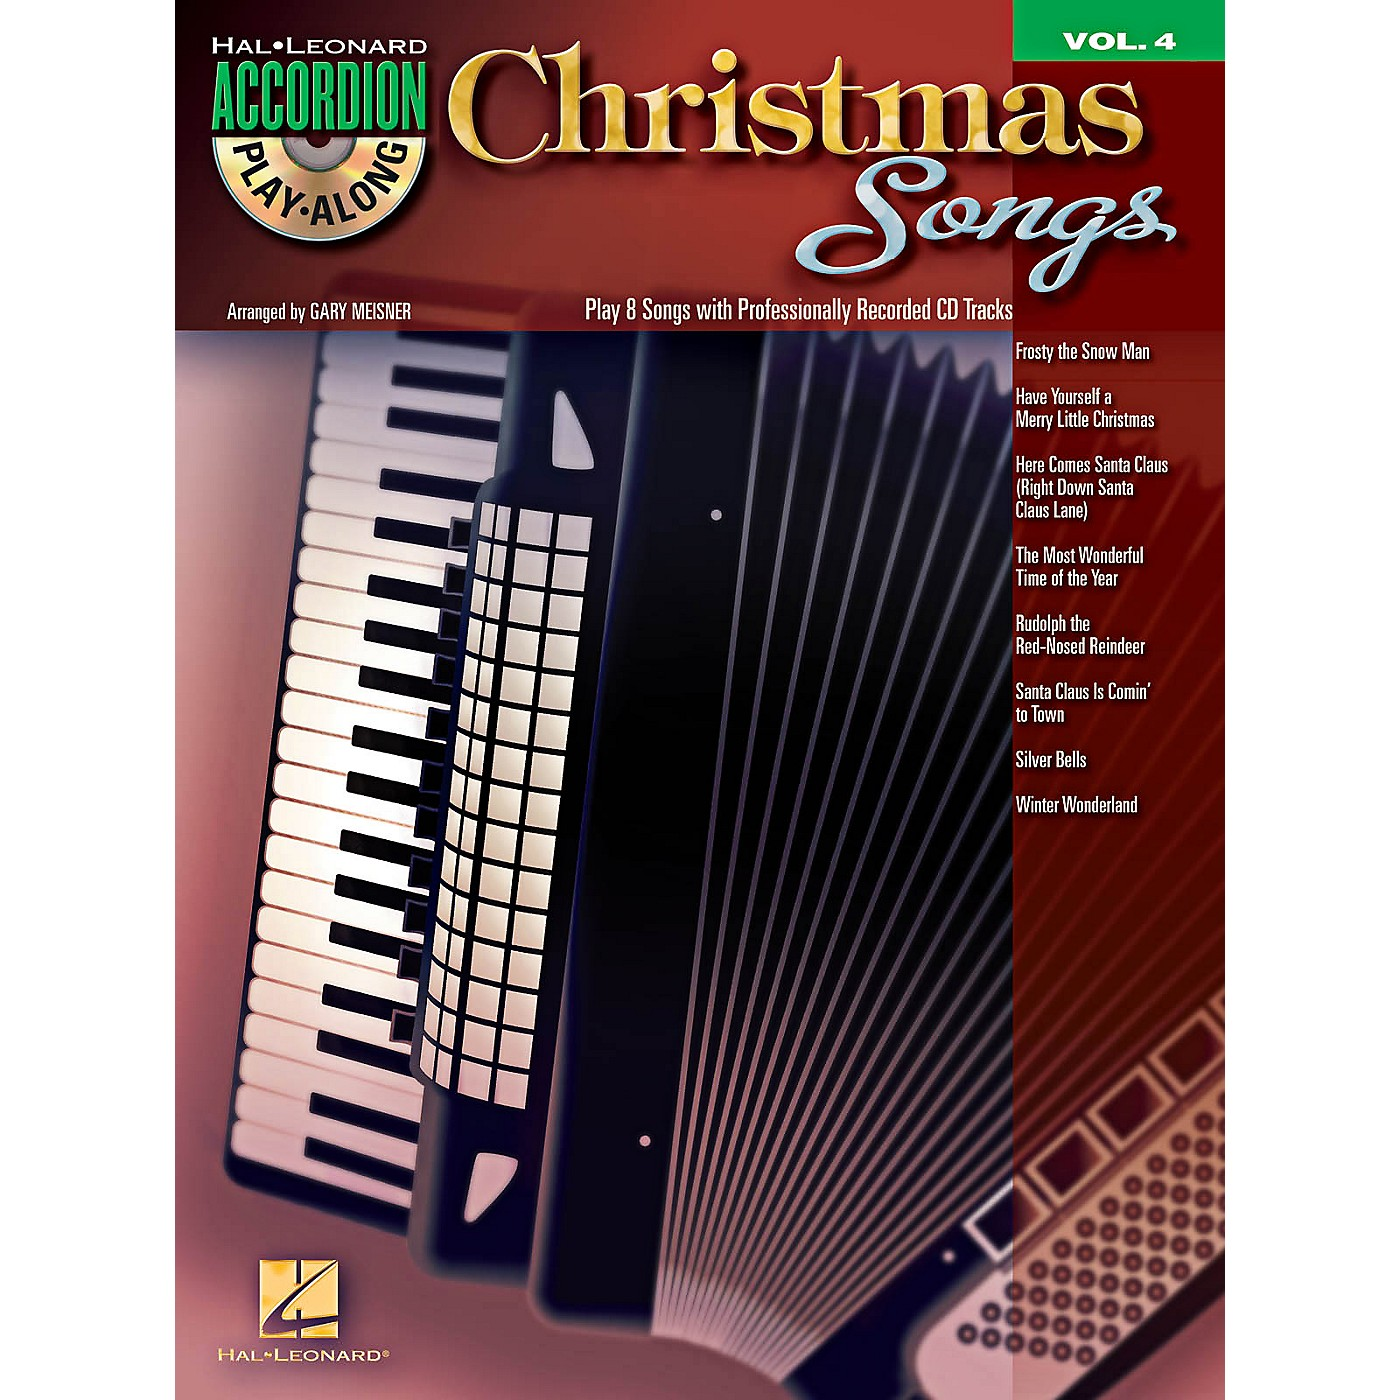 Hal Leonard Christmas Songs - Accordion Play-Along Volume 4 Book/CD thumbnail